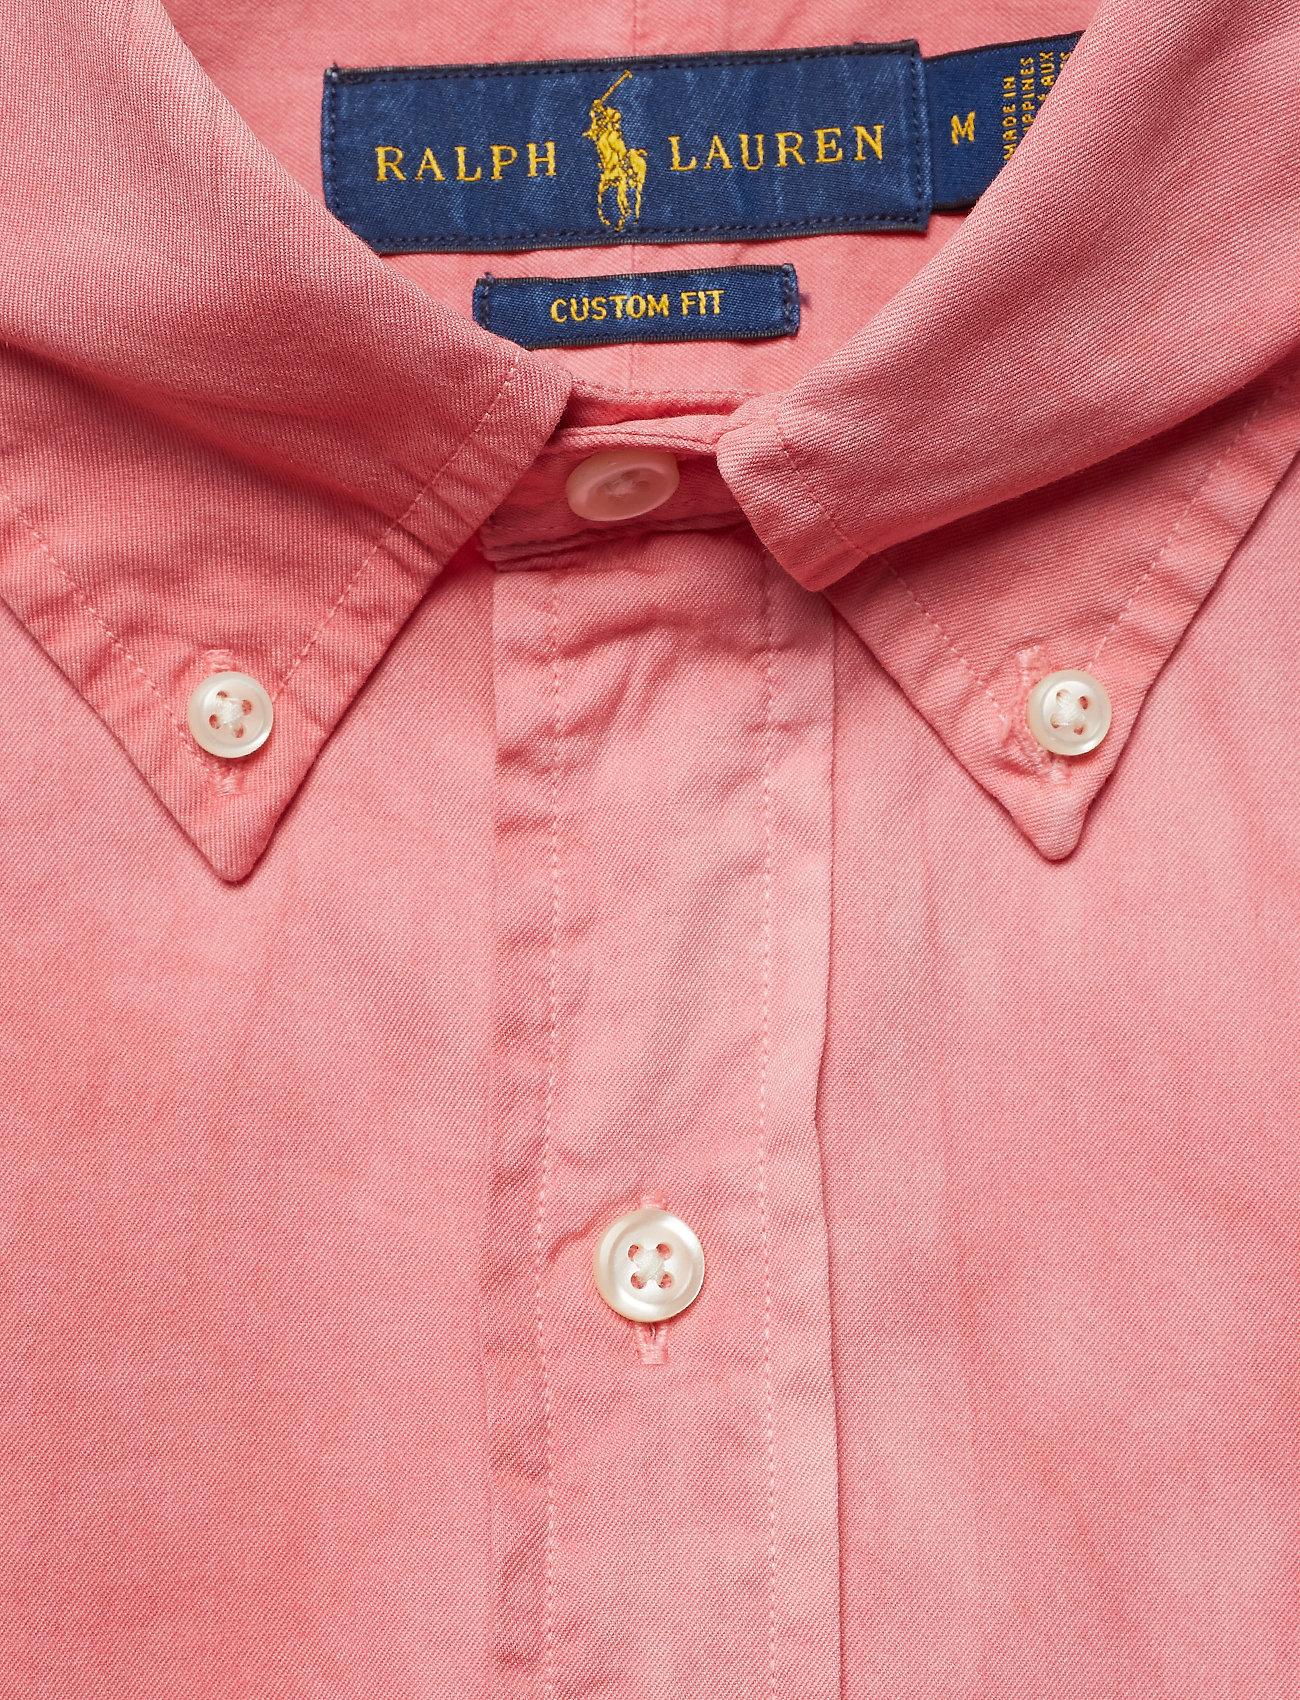 Fit Shirtred Custom Twill Lauren Ralph SkyPolo doCBQrxWe